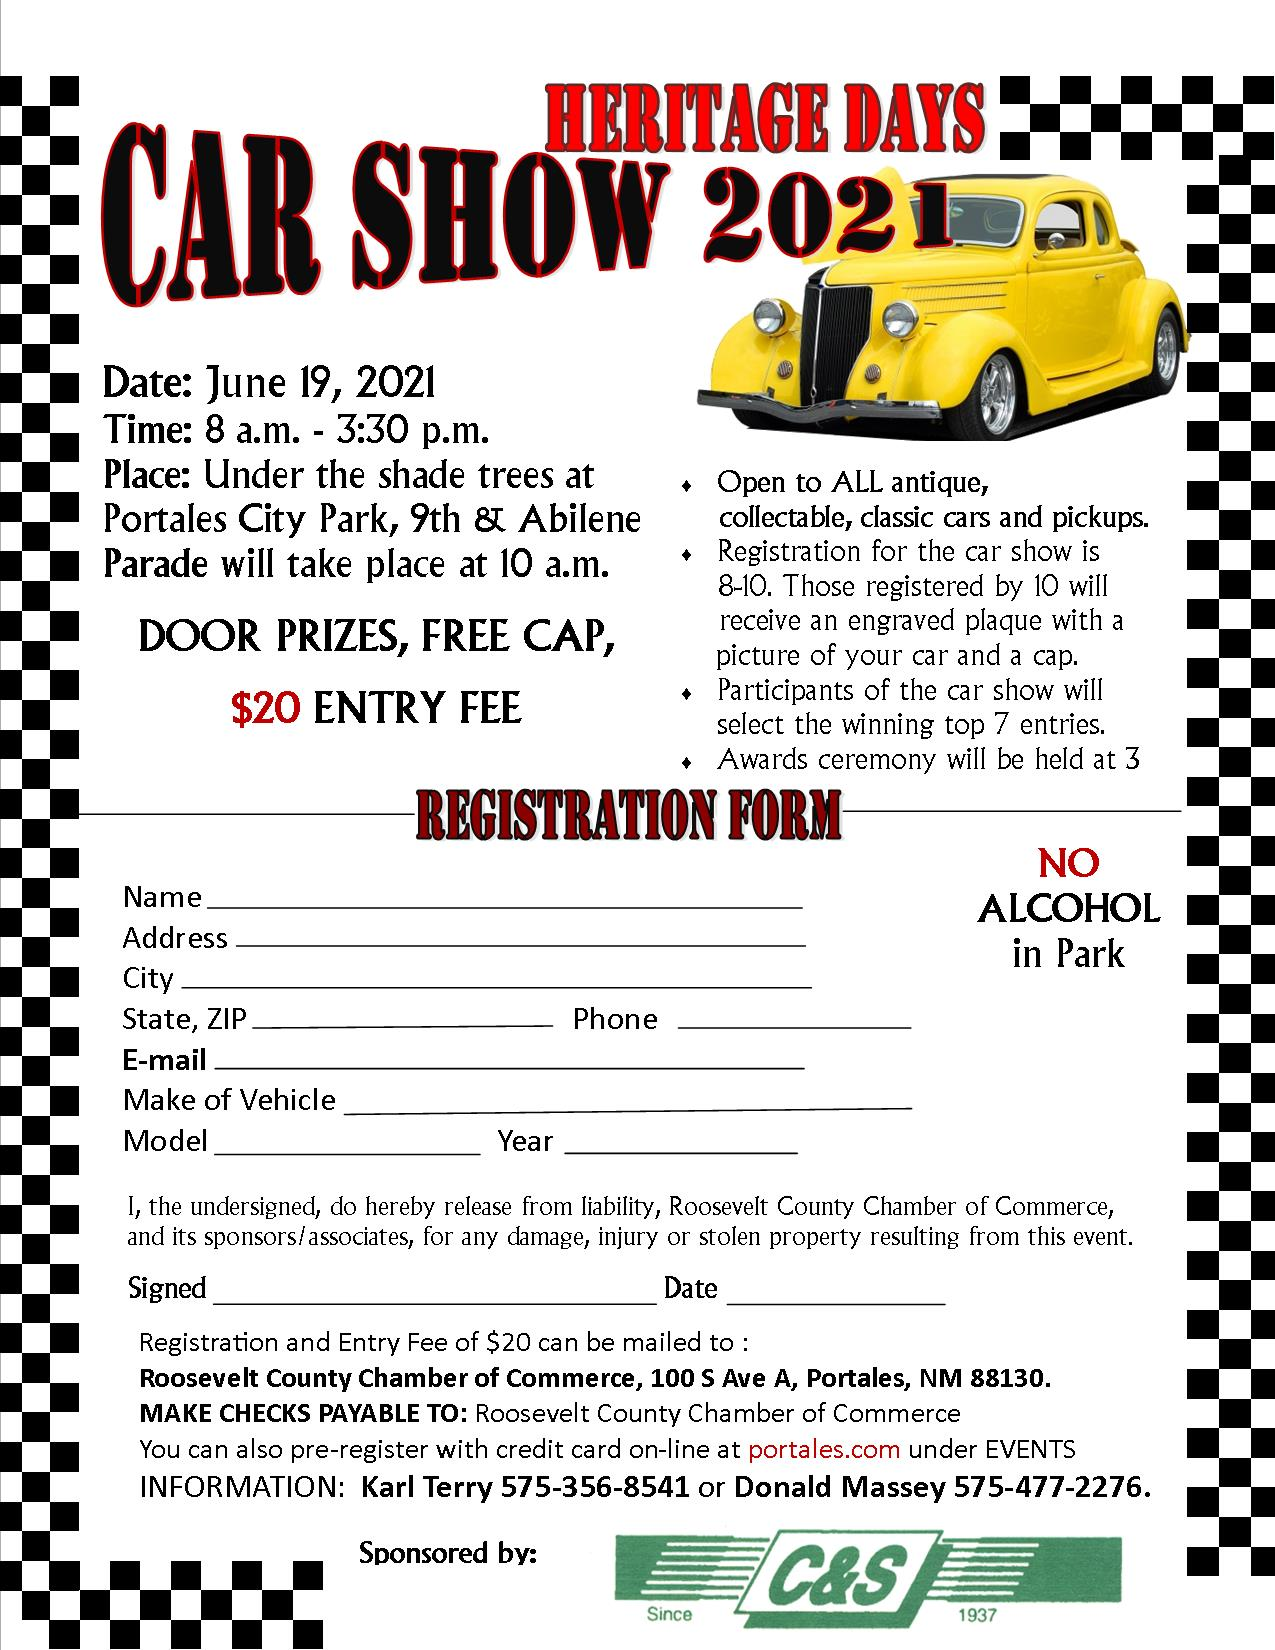 CarShowRegistrationForm2021.jpg